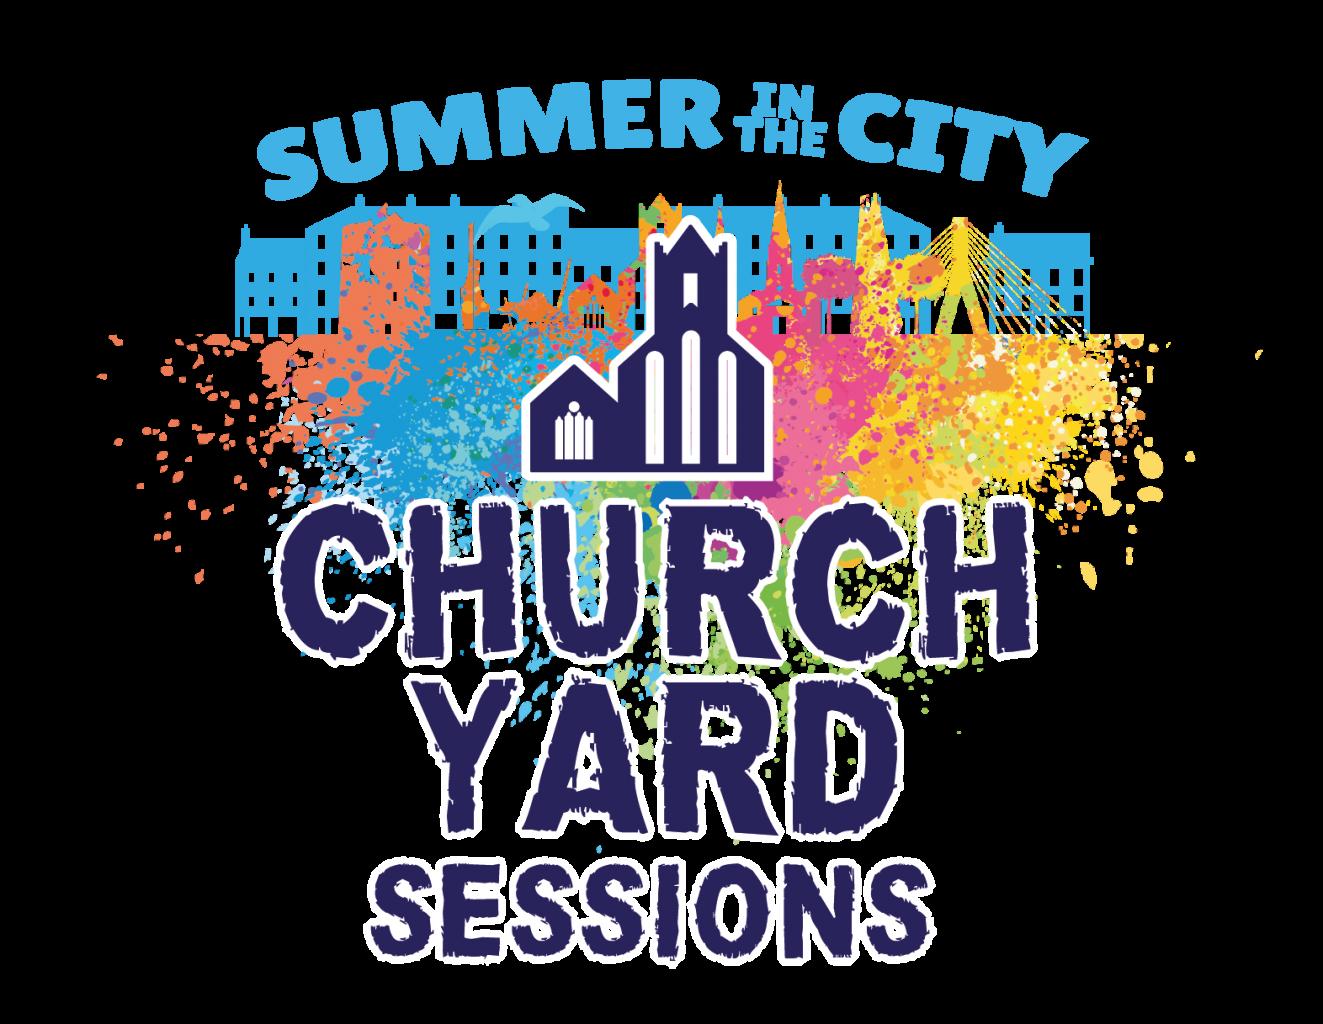 Churchyard Sessions Logo